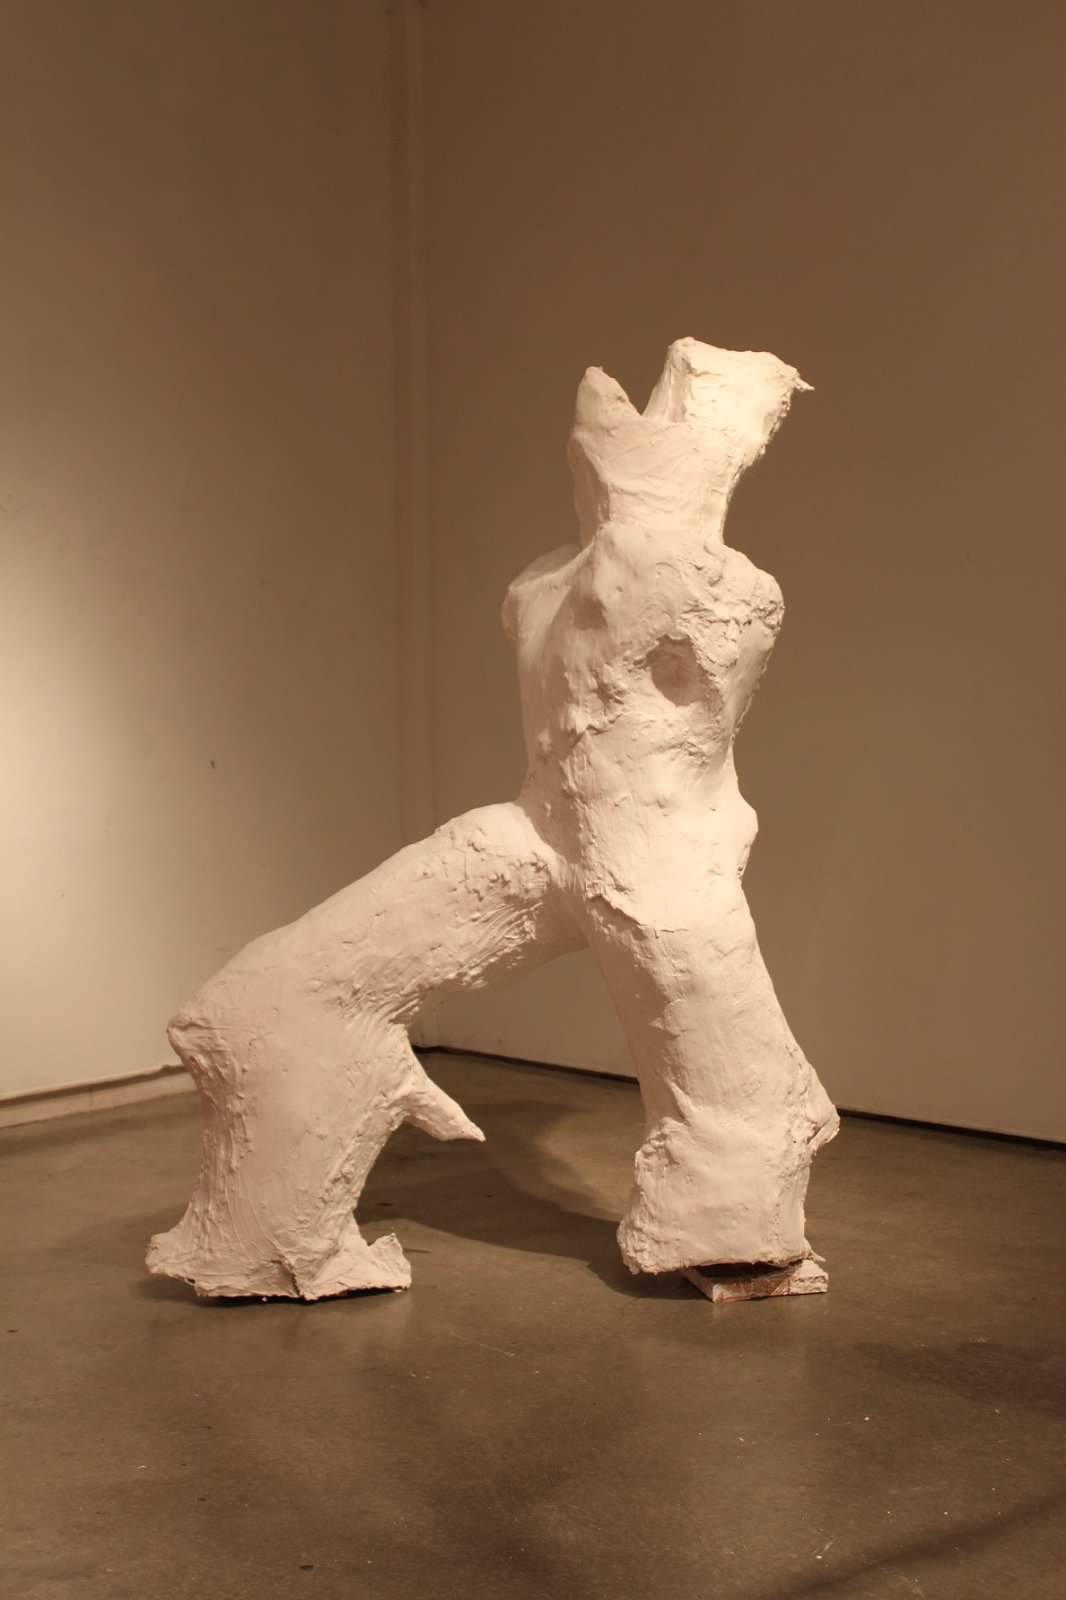 Futurism_Sculpture.jpg